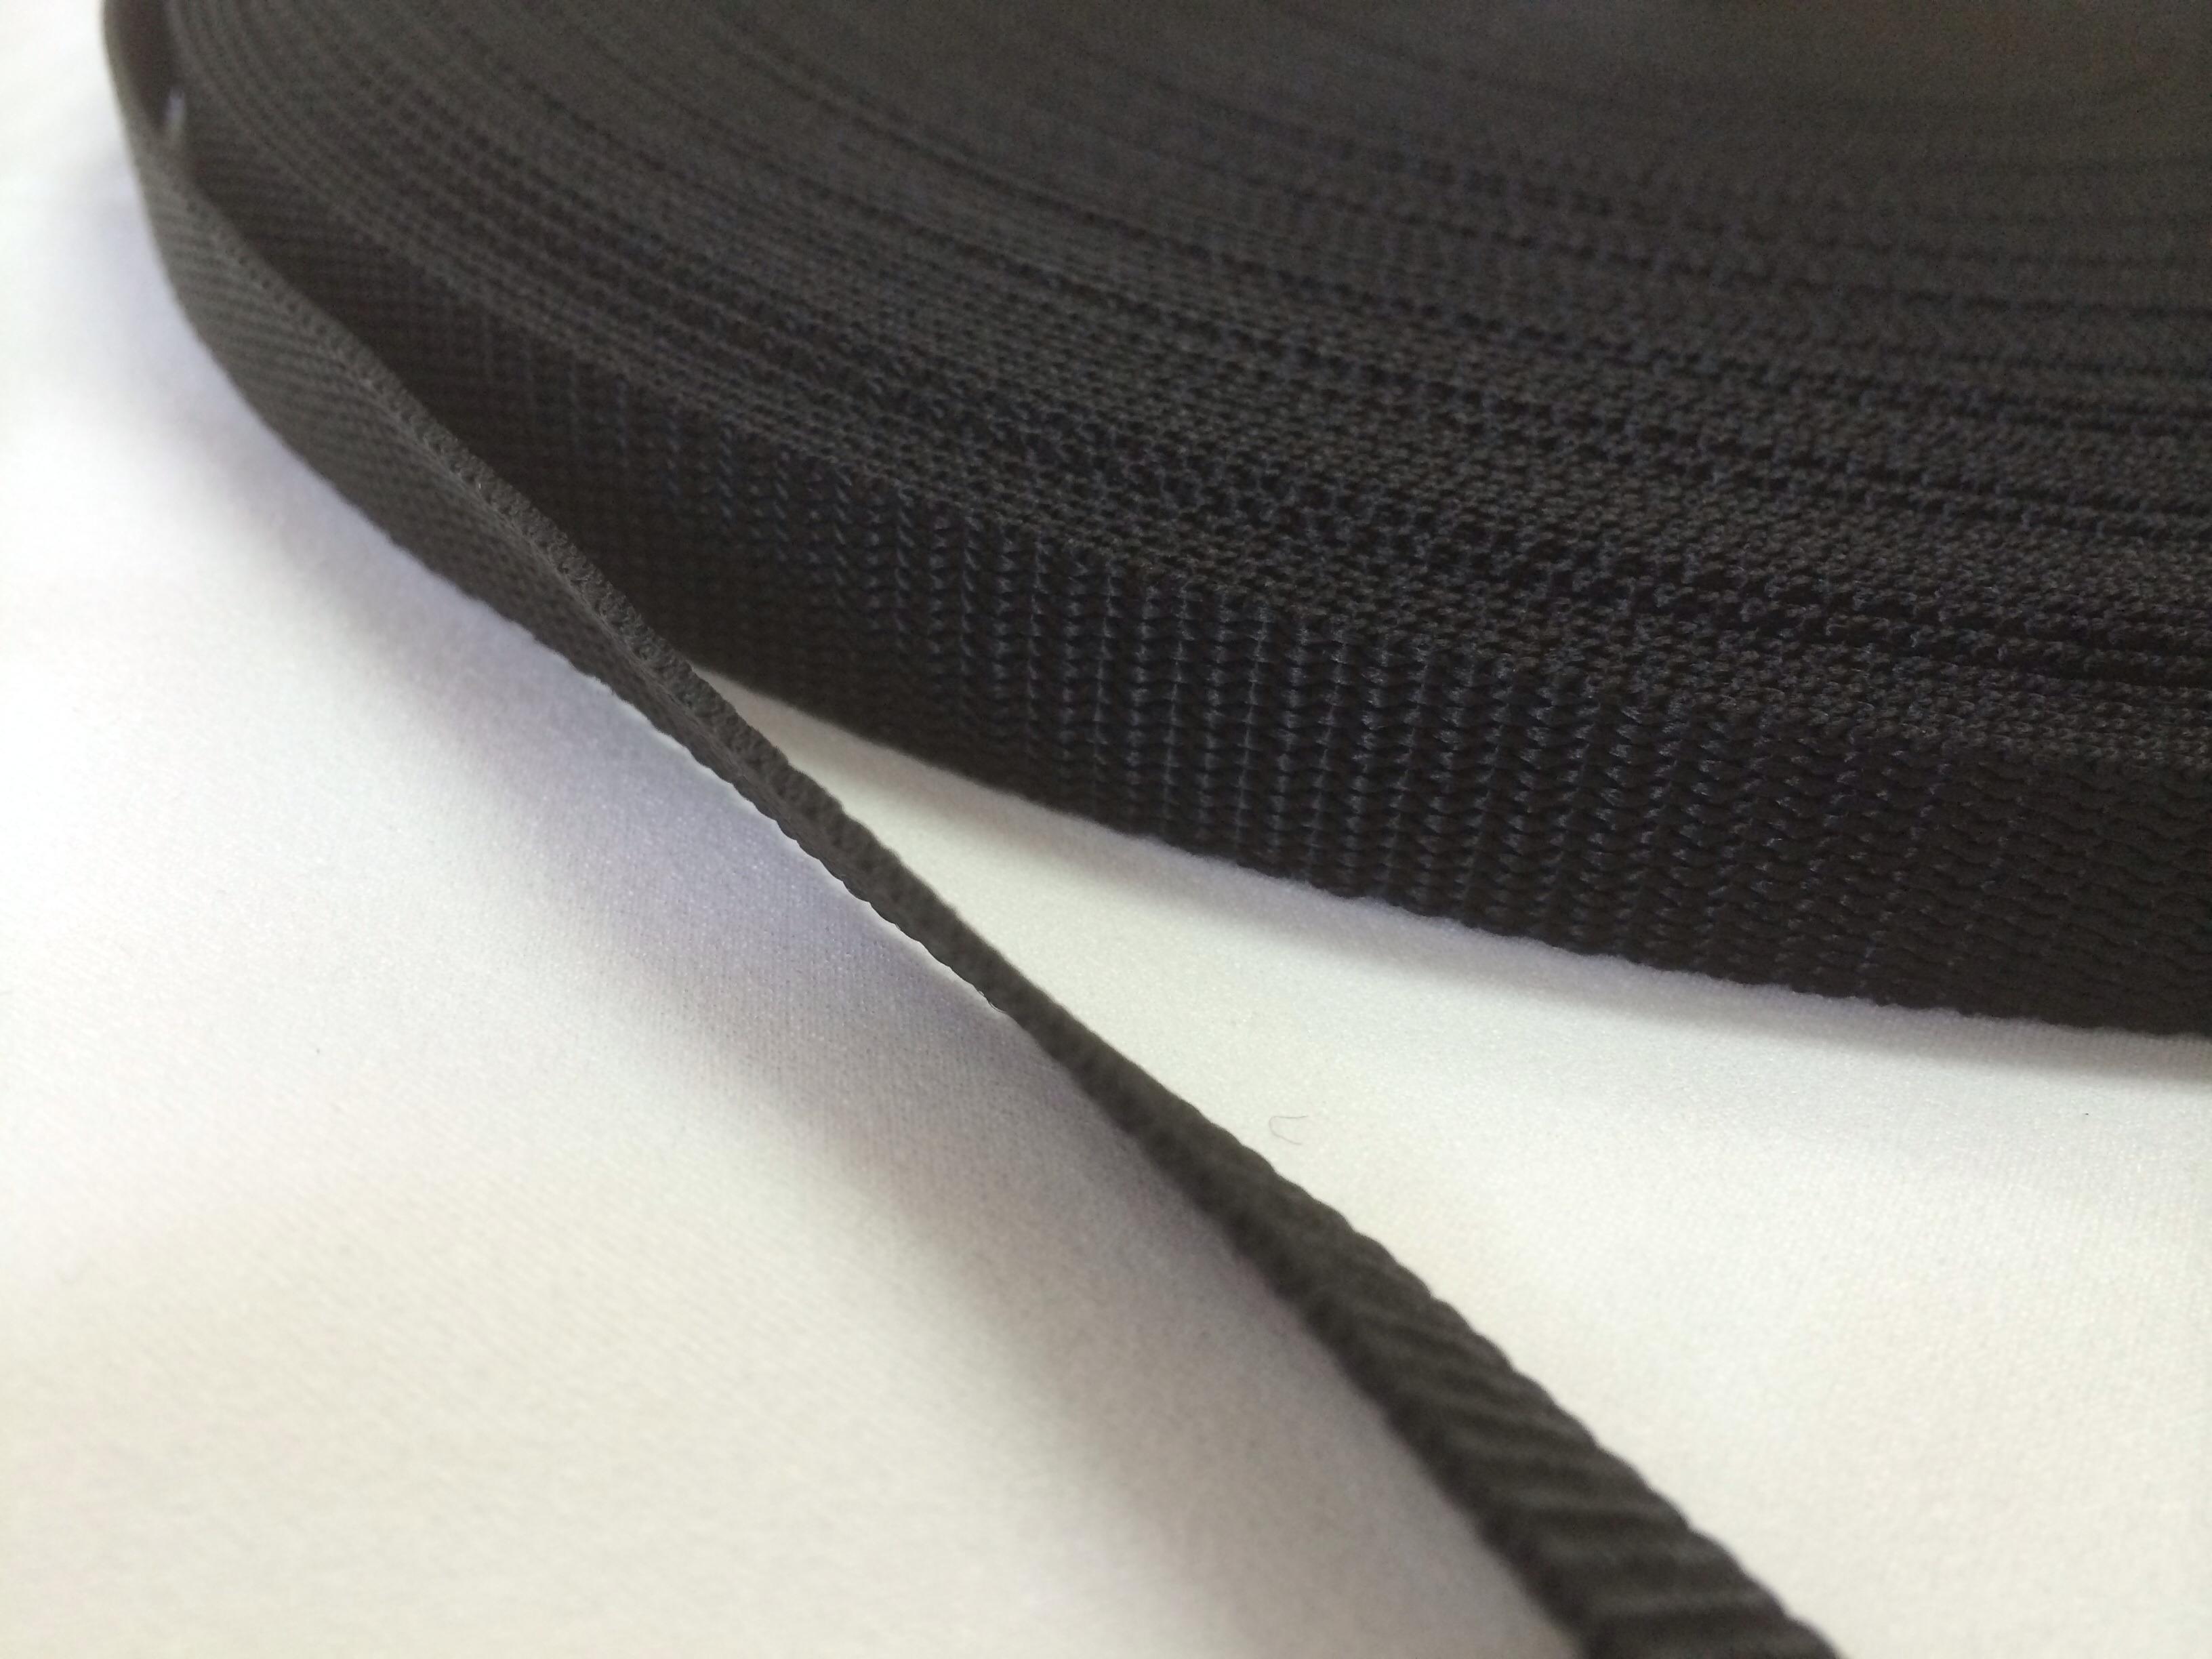 SALE!! 新価格 PPテープ 16mm幅 1.2mm厚 黒 50m巻